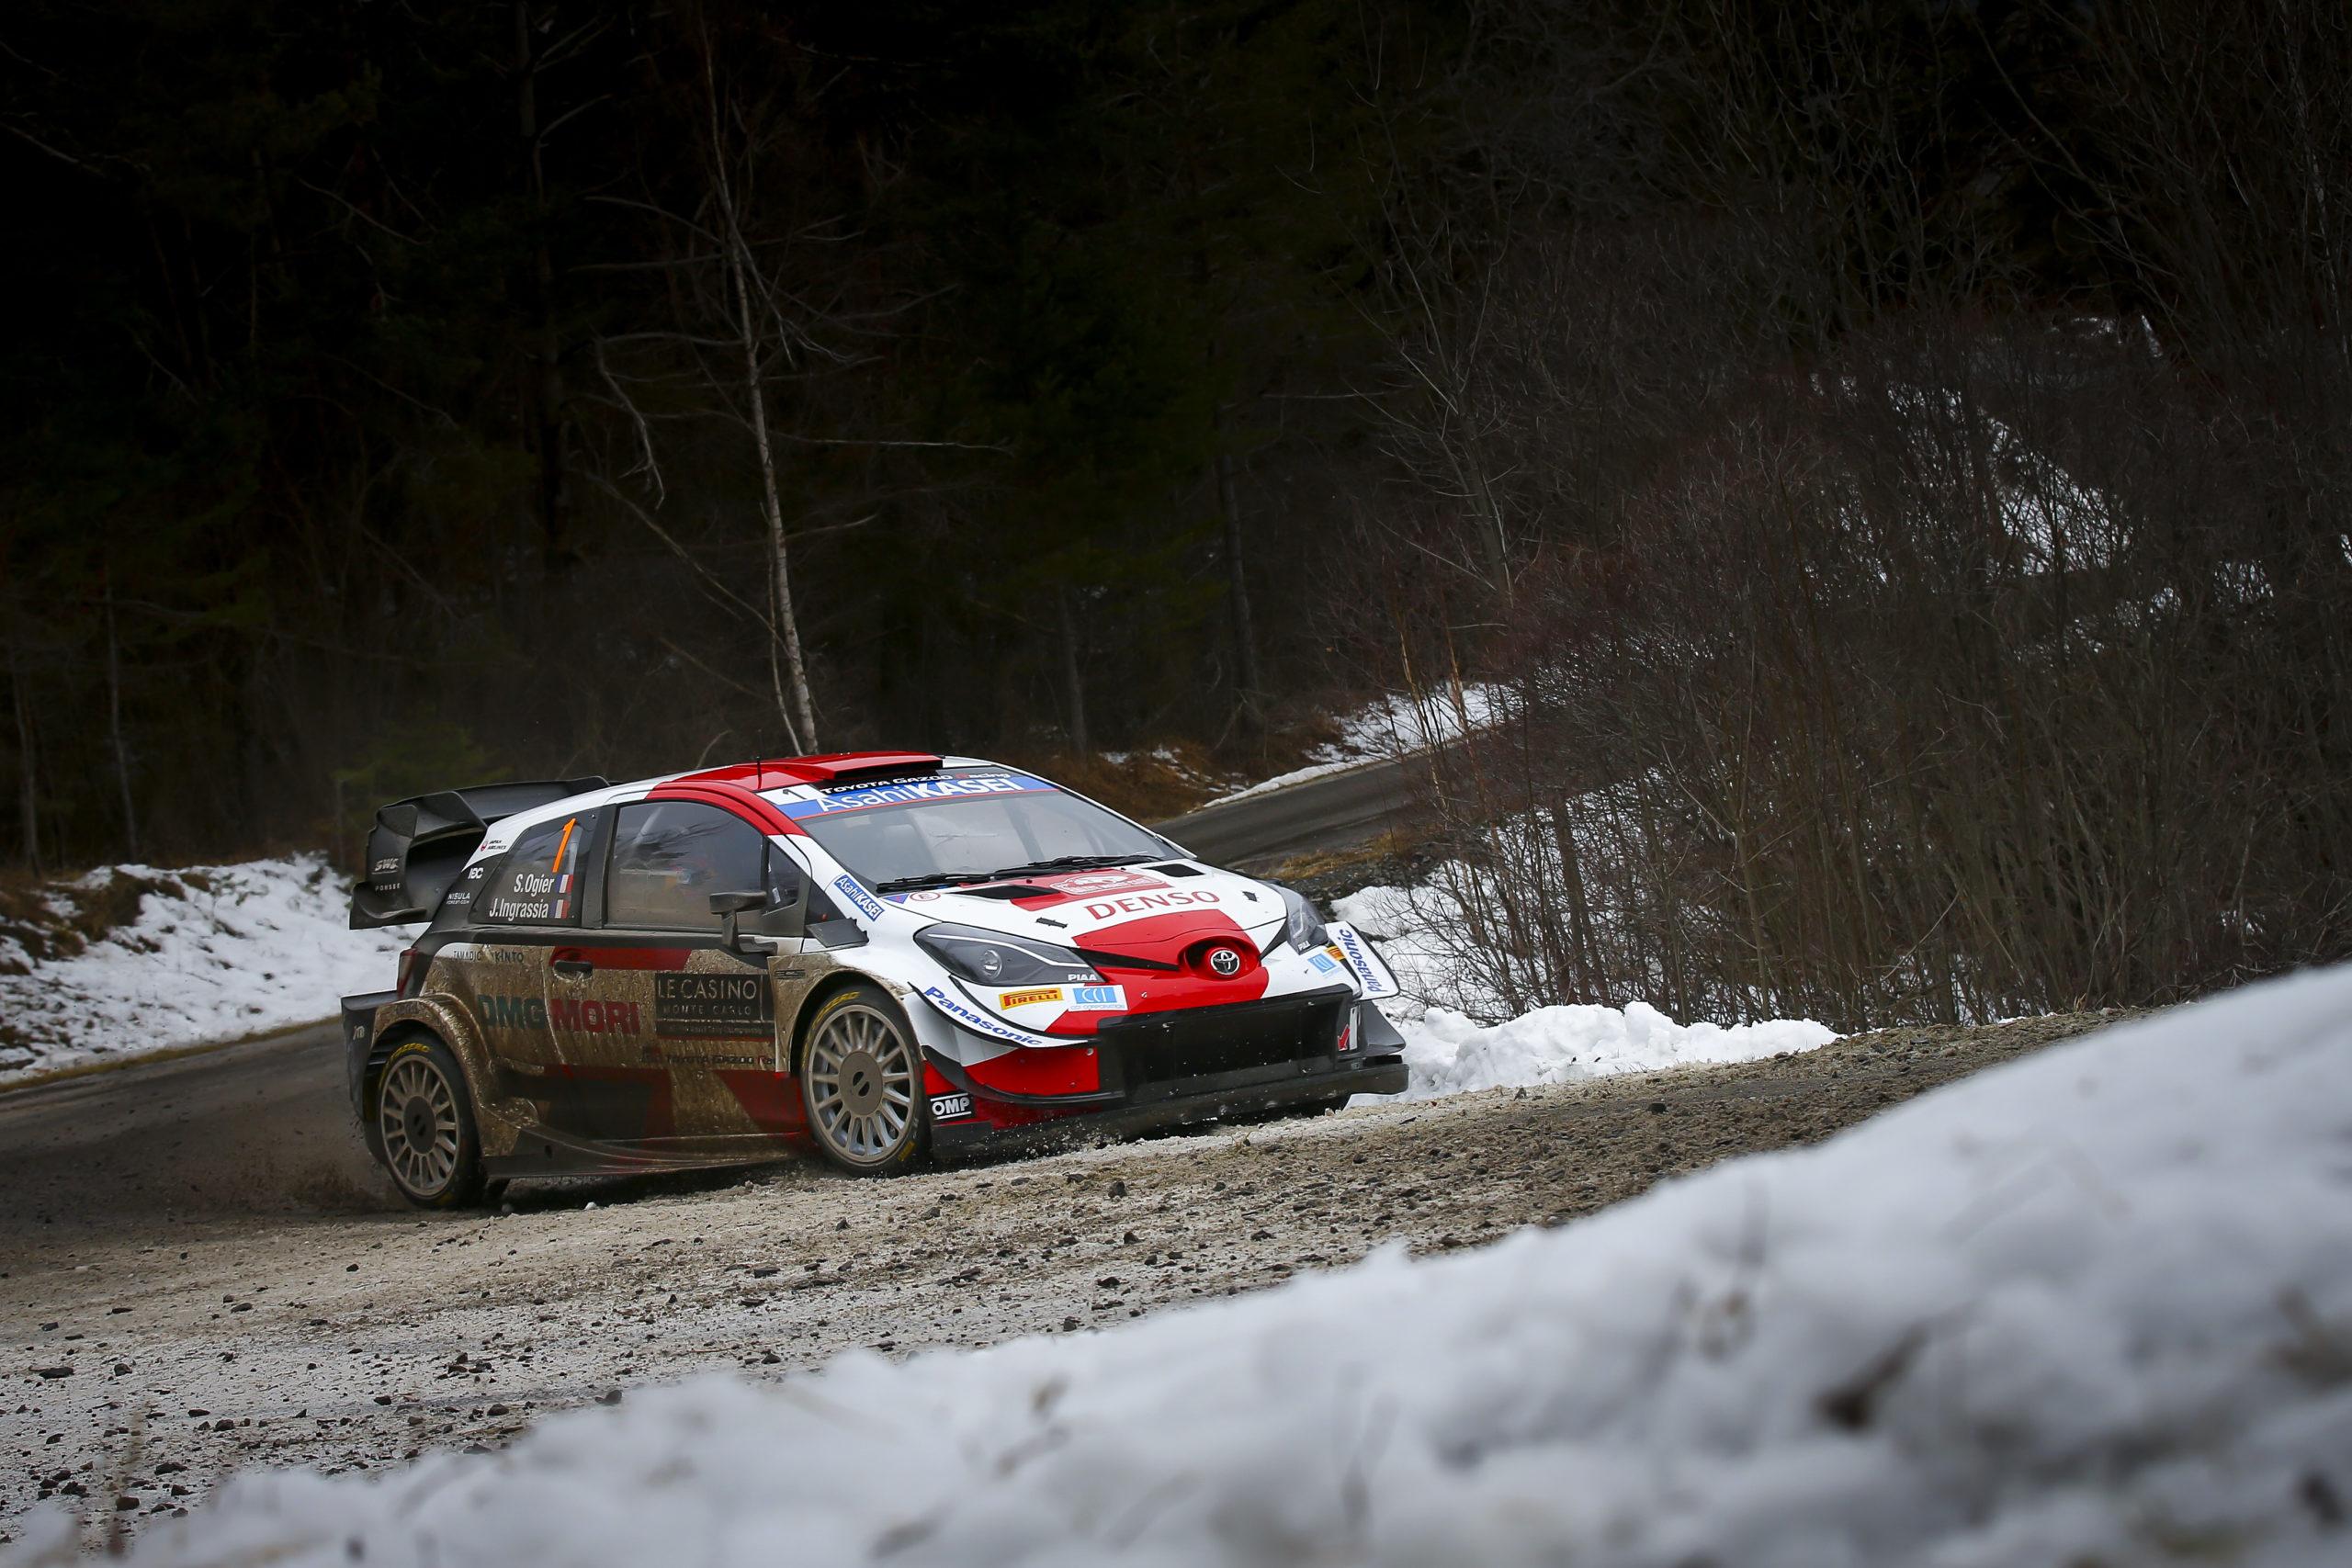 2021 FIA World Rally Championship / Round 01 / Monte Carlo Rally / 21-24 January, 2021 // Worldwide Copyright: Toyota Gazoo Racing WRT, Sébastien Ogier